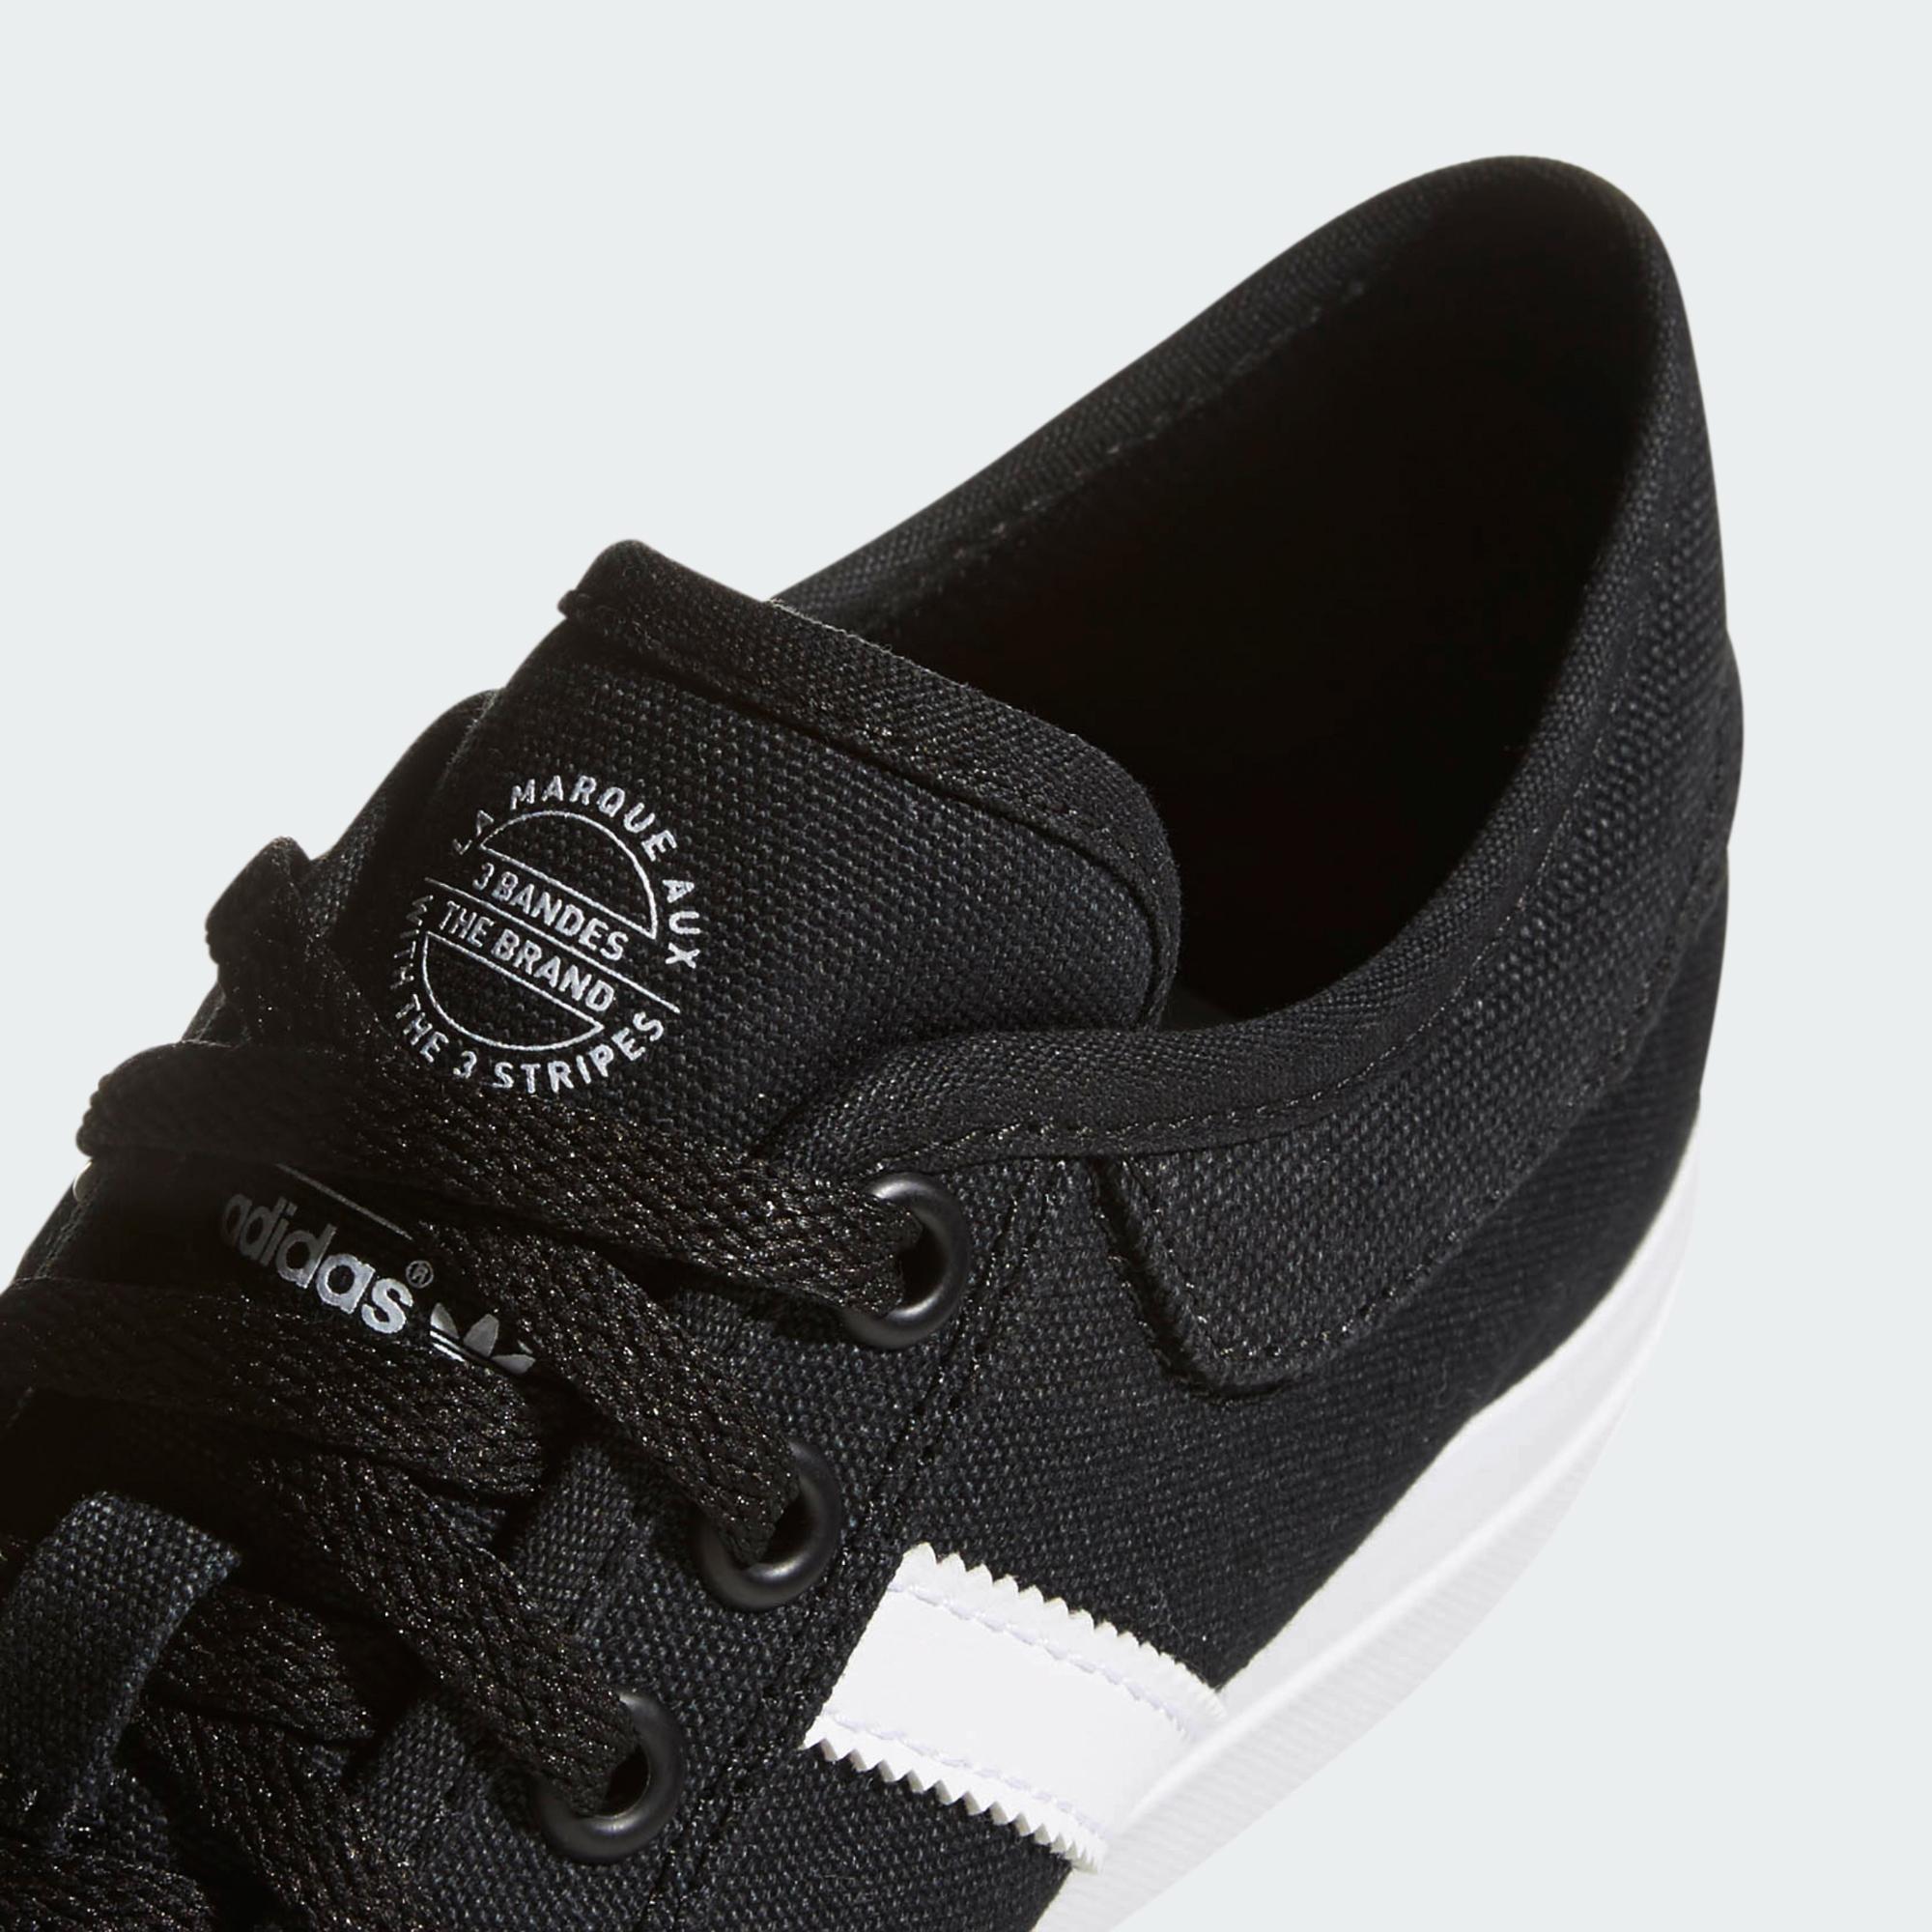 098f438ce92 Sentinel Adidas Skateboarding - Matchcourt - Skate Shoes